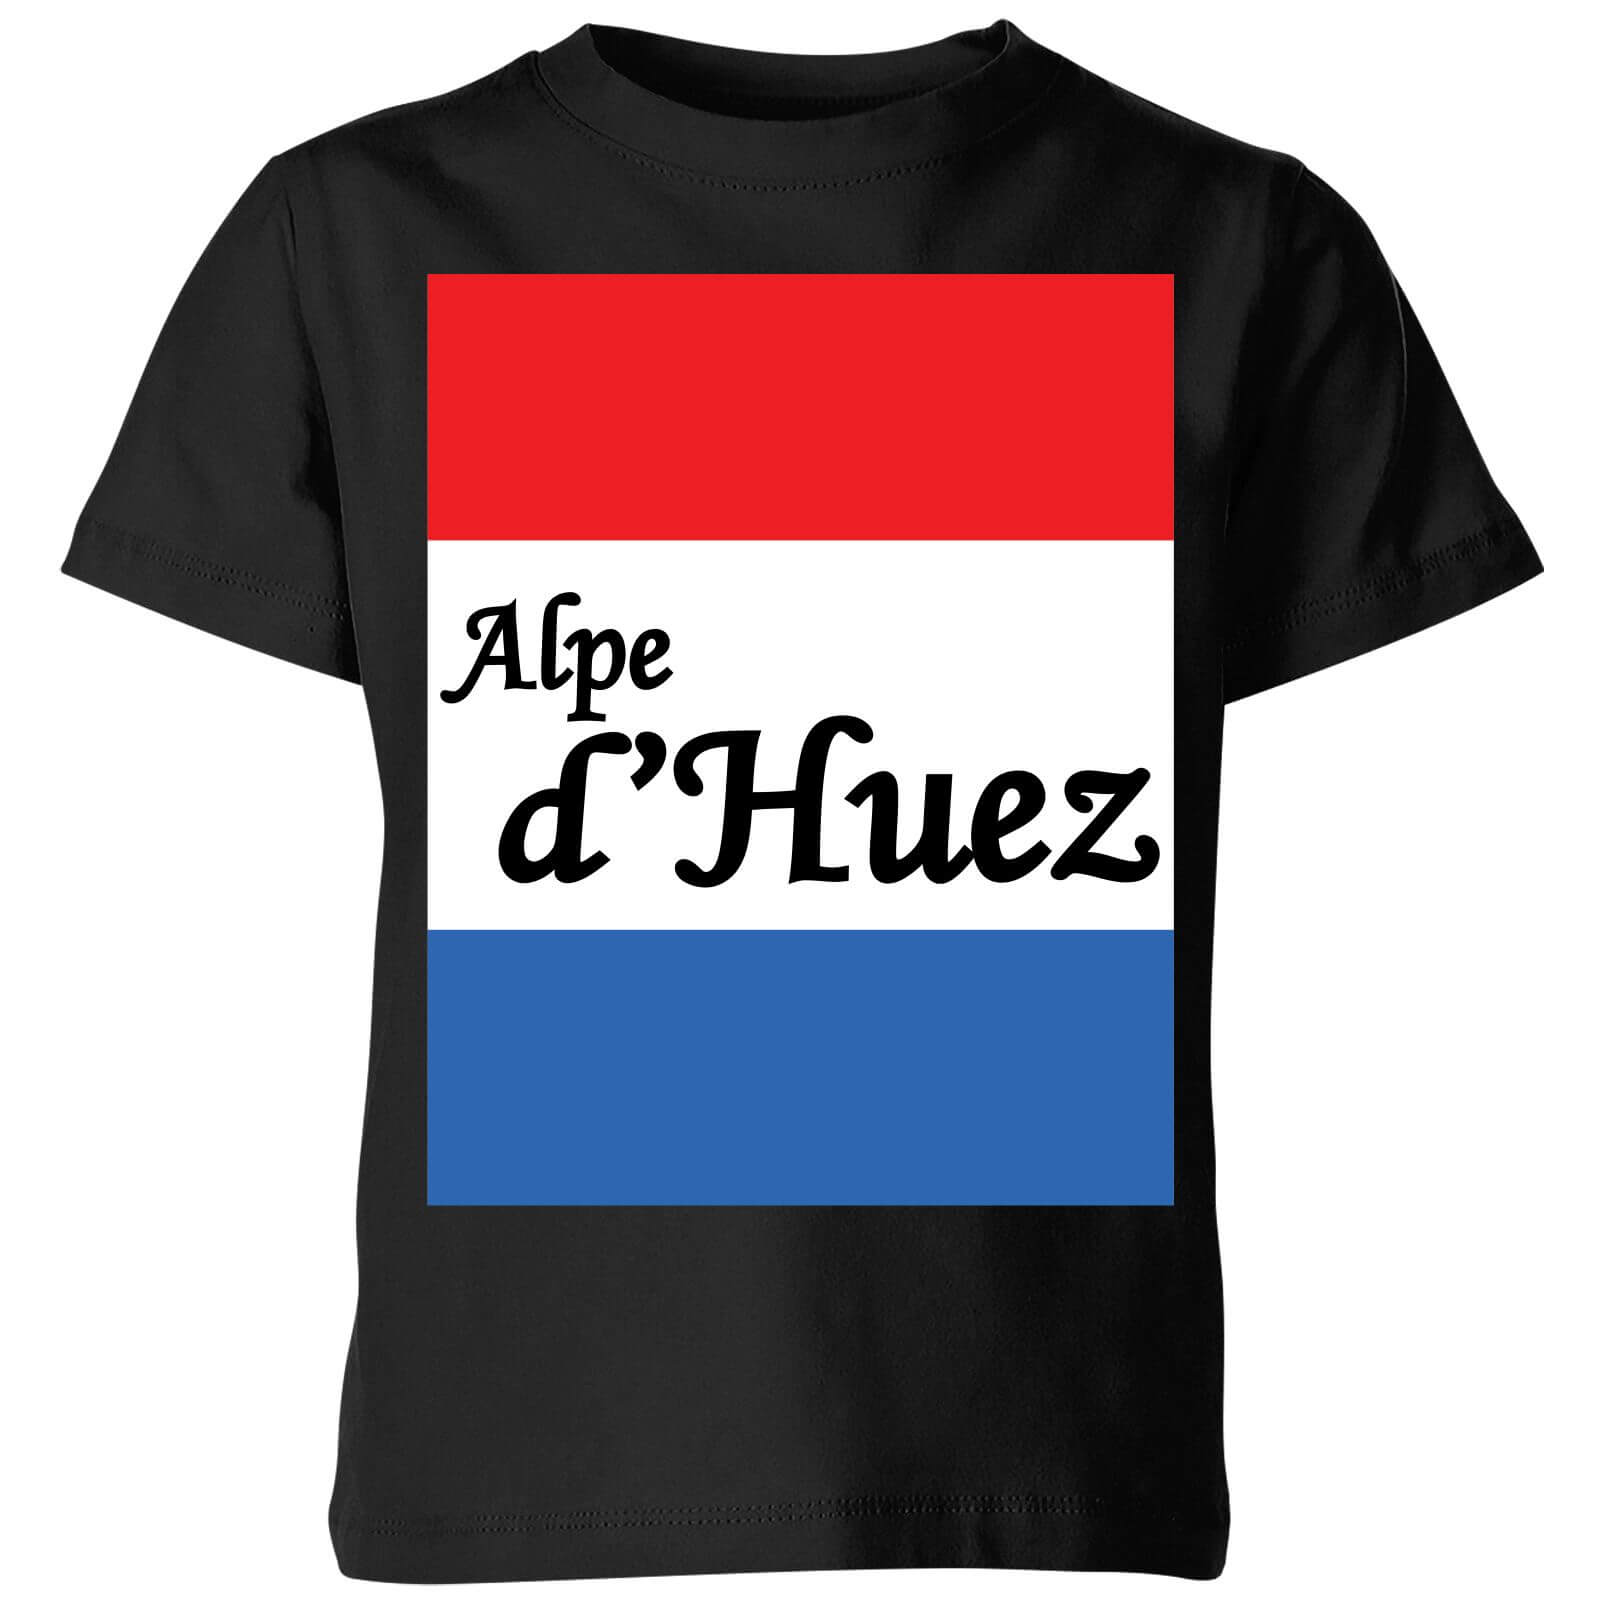 Summit Finish Alpe Dhuez Kids T-shirt - Black - 7-8 Years - Black